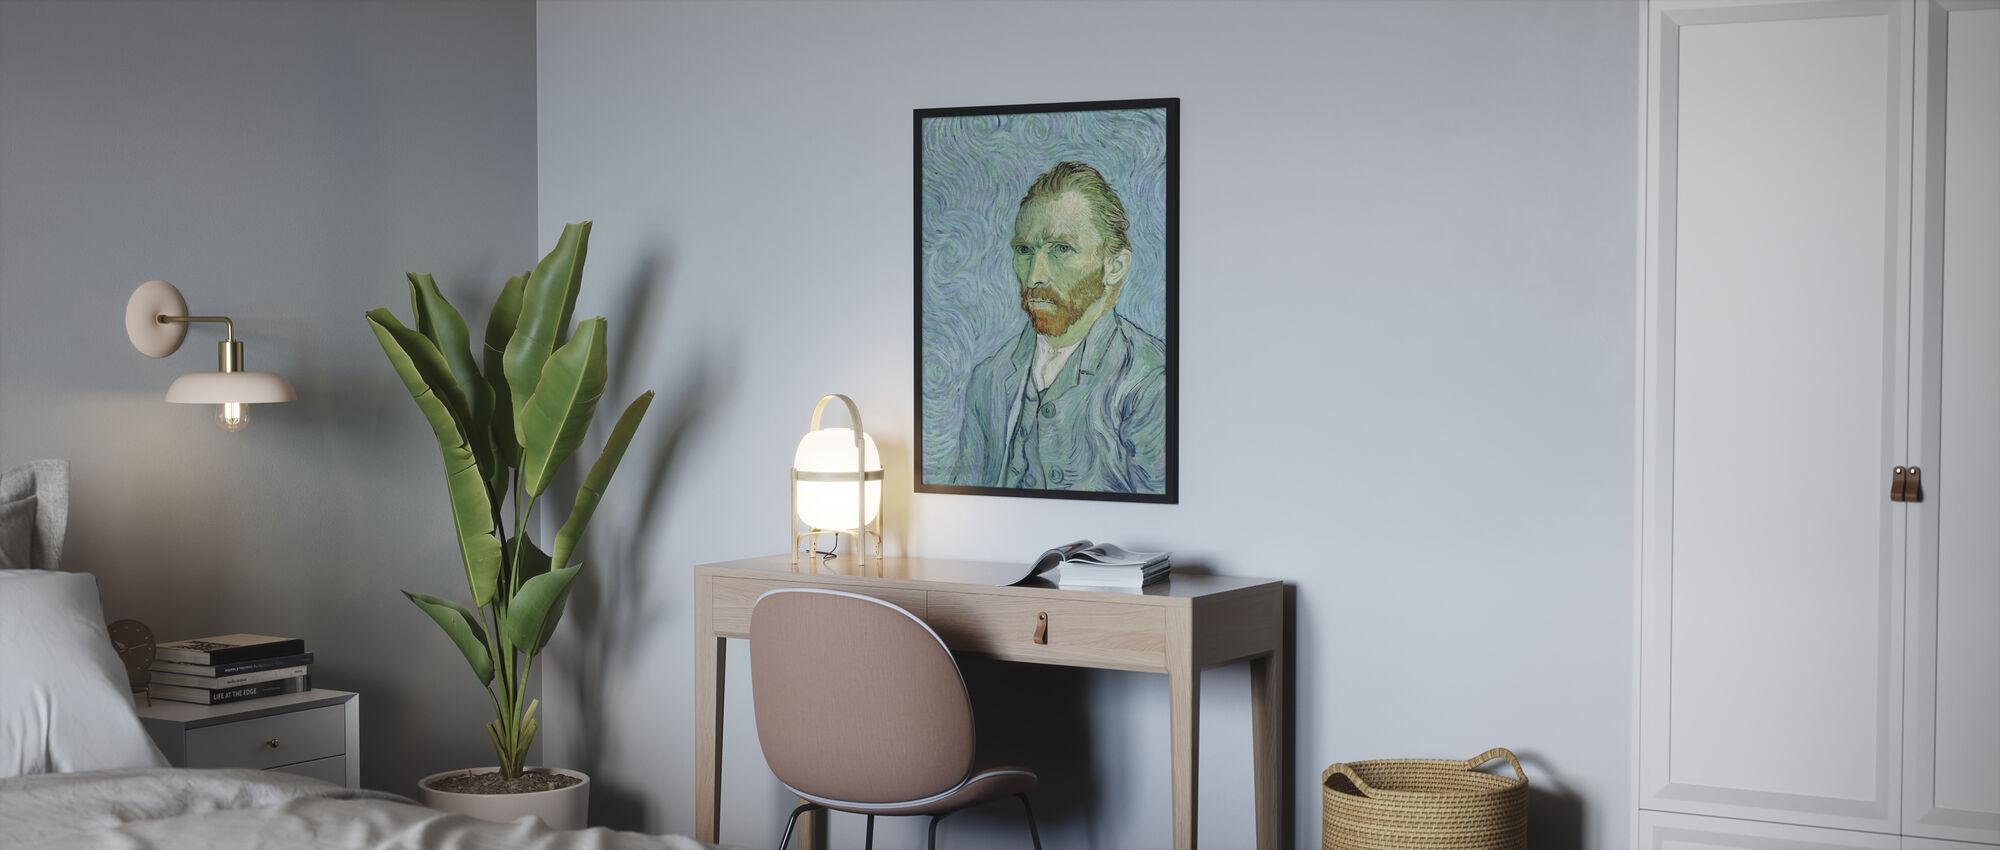 Self portrait, Vincent van Gogh - Poster - Bedroom